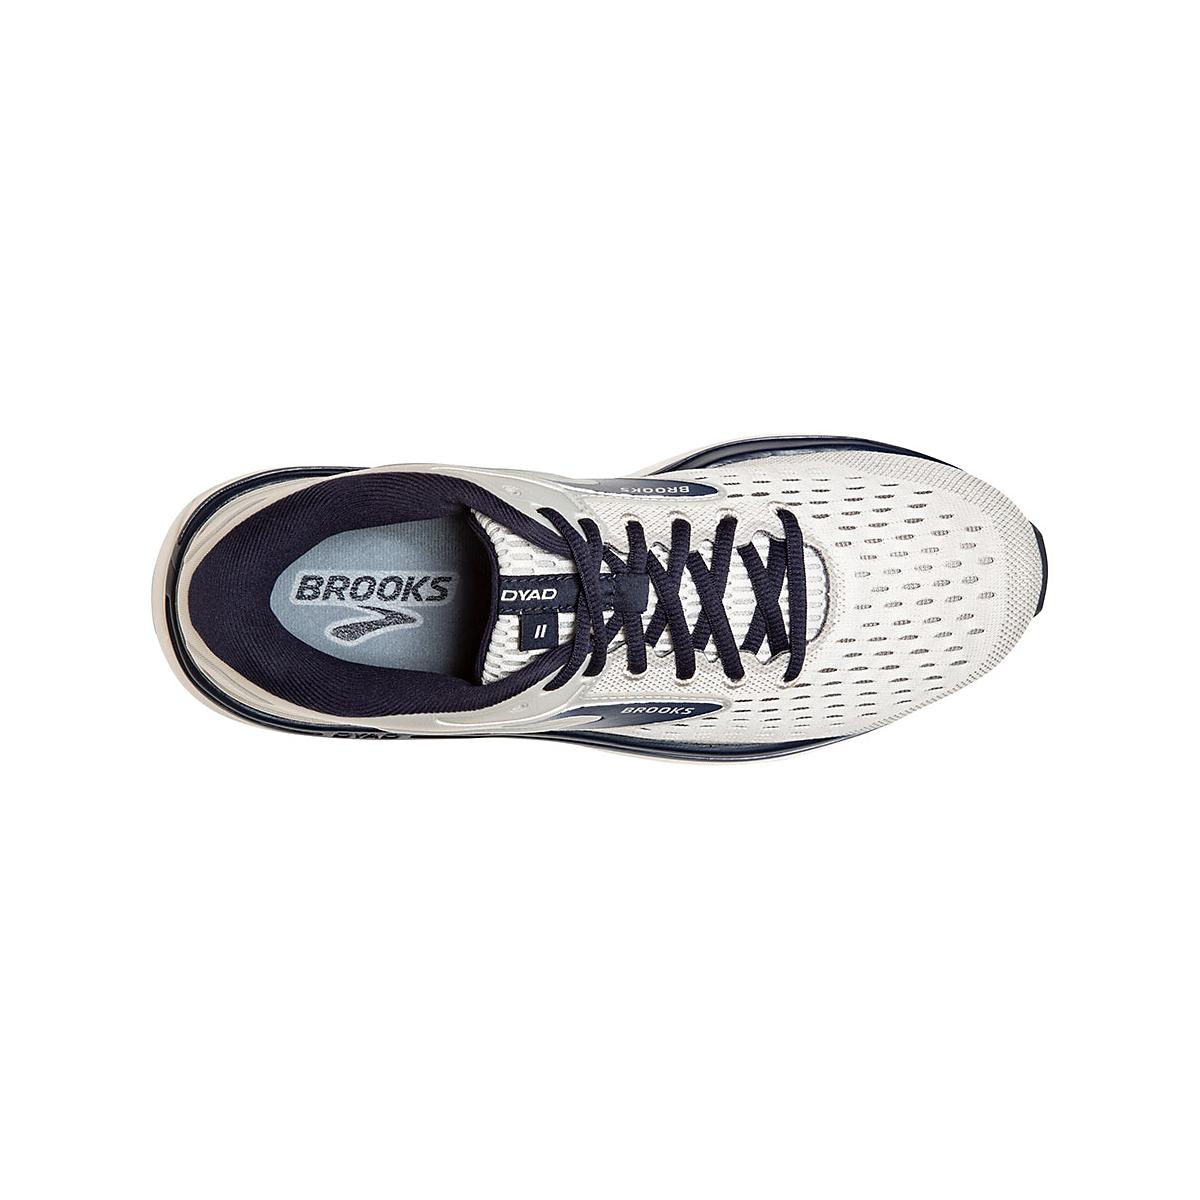 Men's Brooks Dyad 11 Running Shoe - Color: Antarctica/Grey/Peacoat (Regular Width) - Size: 7, Antarctica/Grey/Peacoat, large, image 4